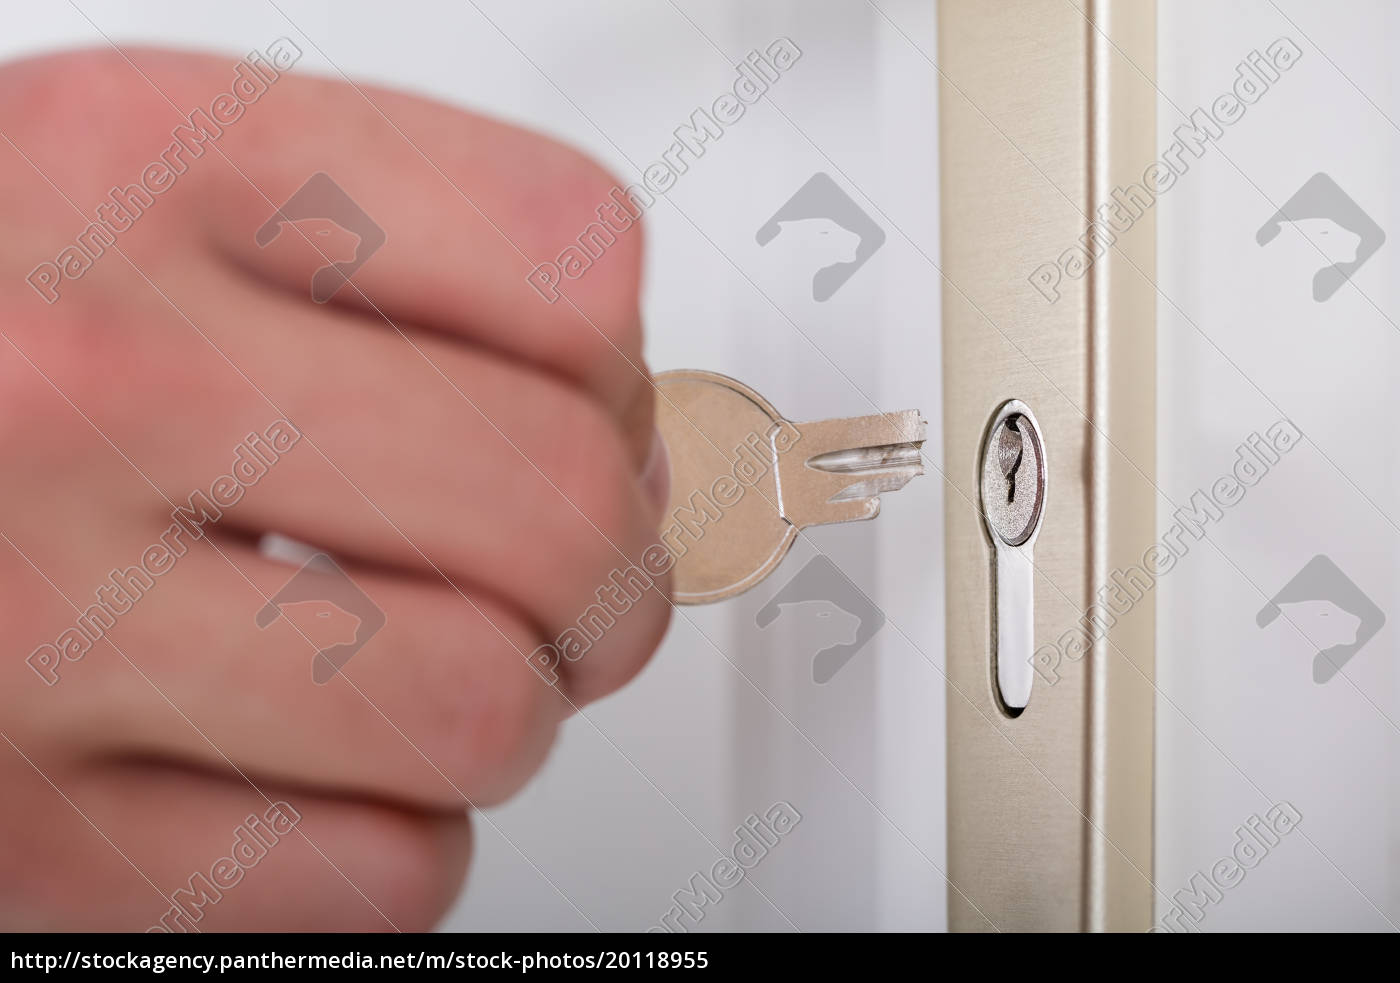 person's, hand, holding, broken, key - 20118955